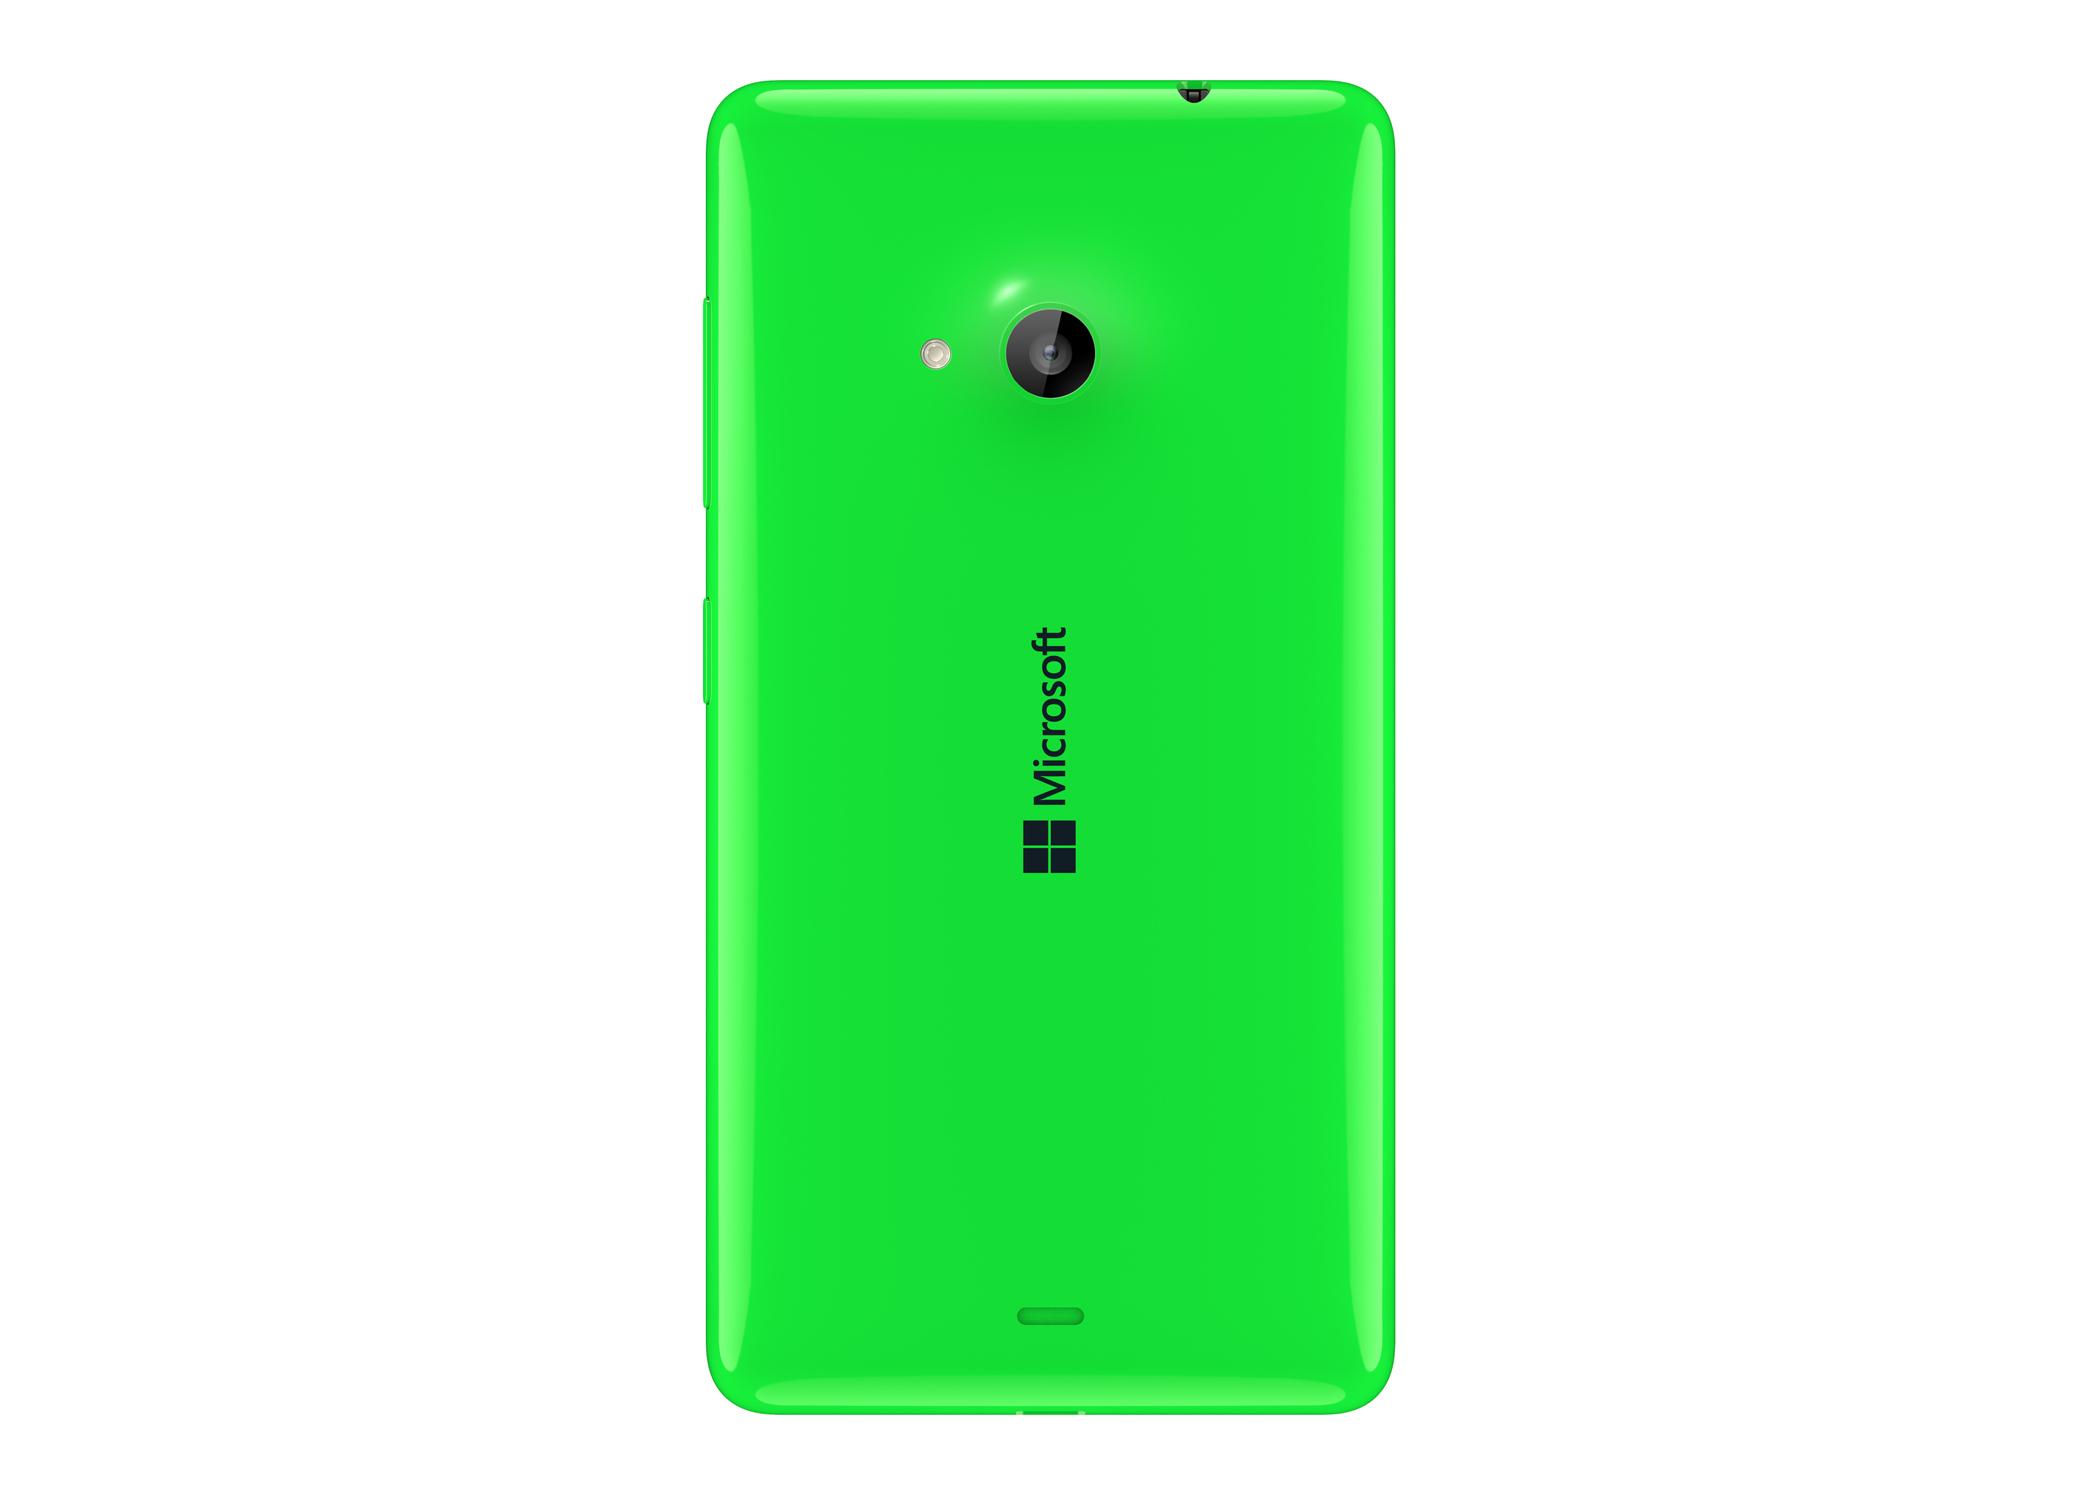 Foto de Nokia Lumia 535 (2/11)